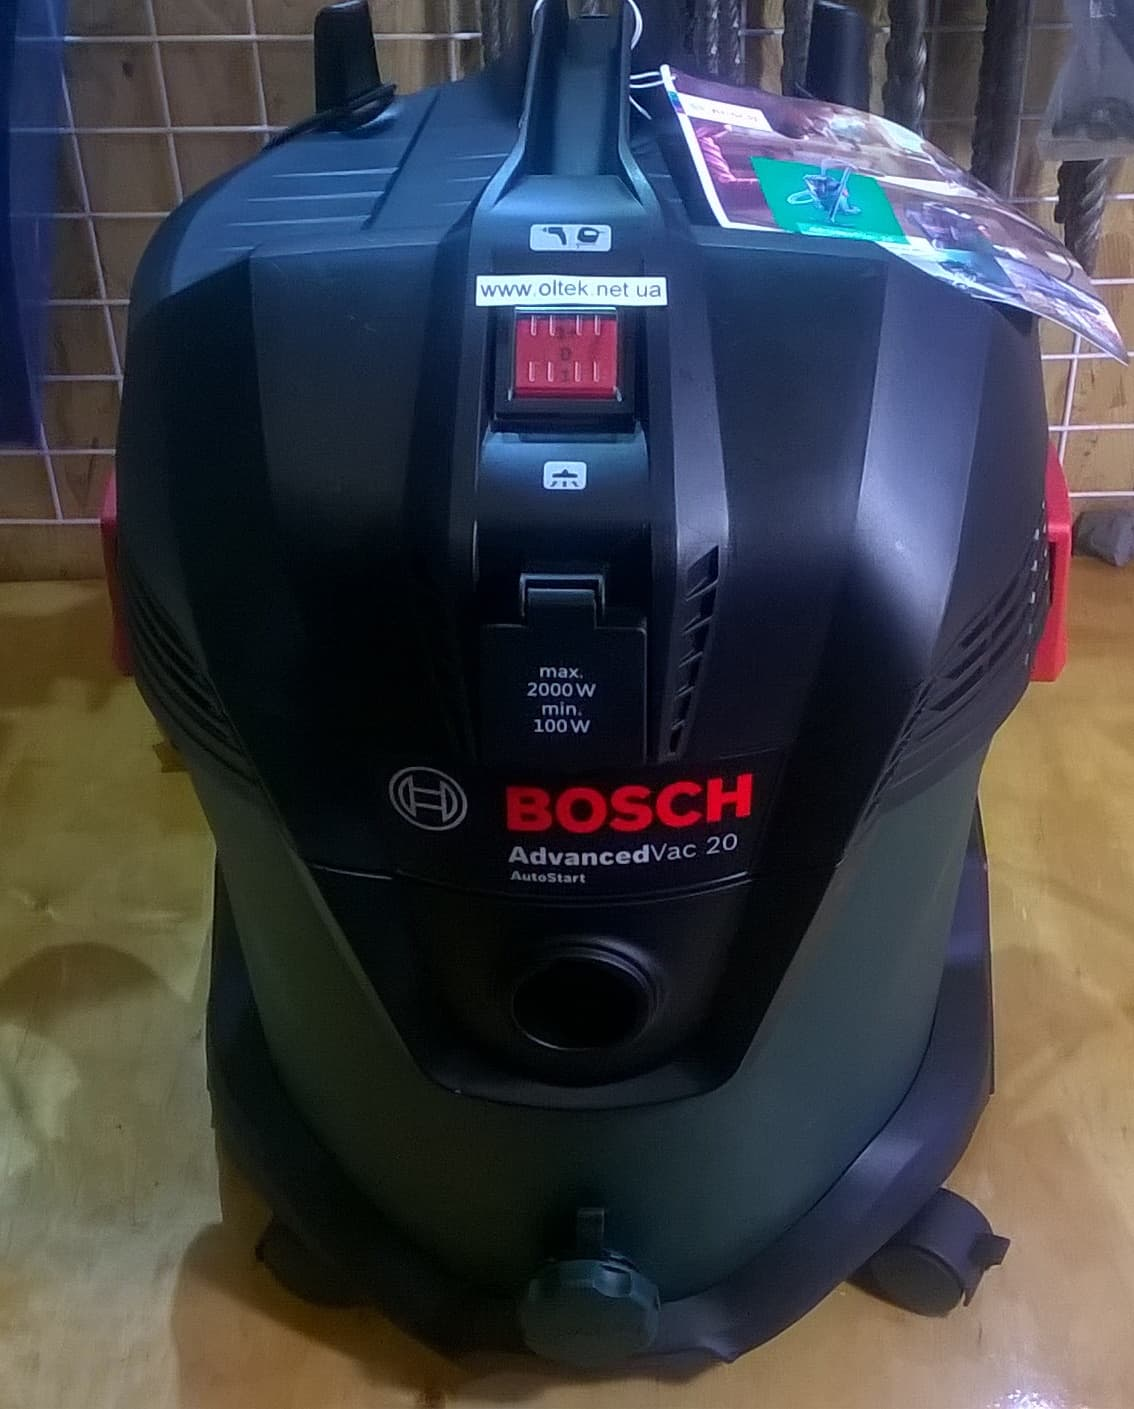 Bosch-VAC-20